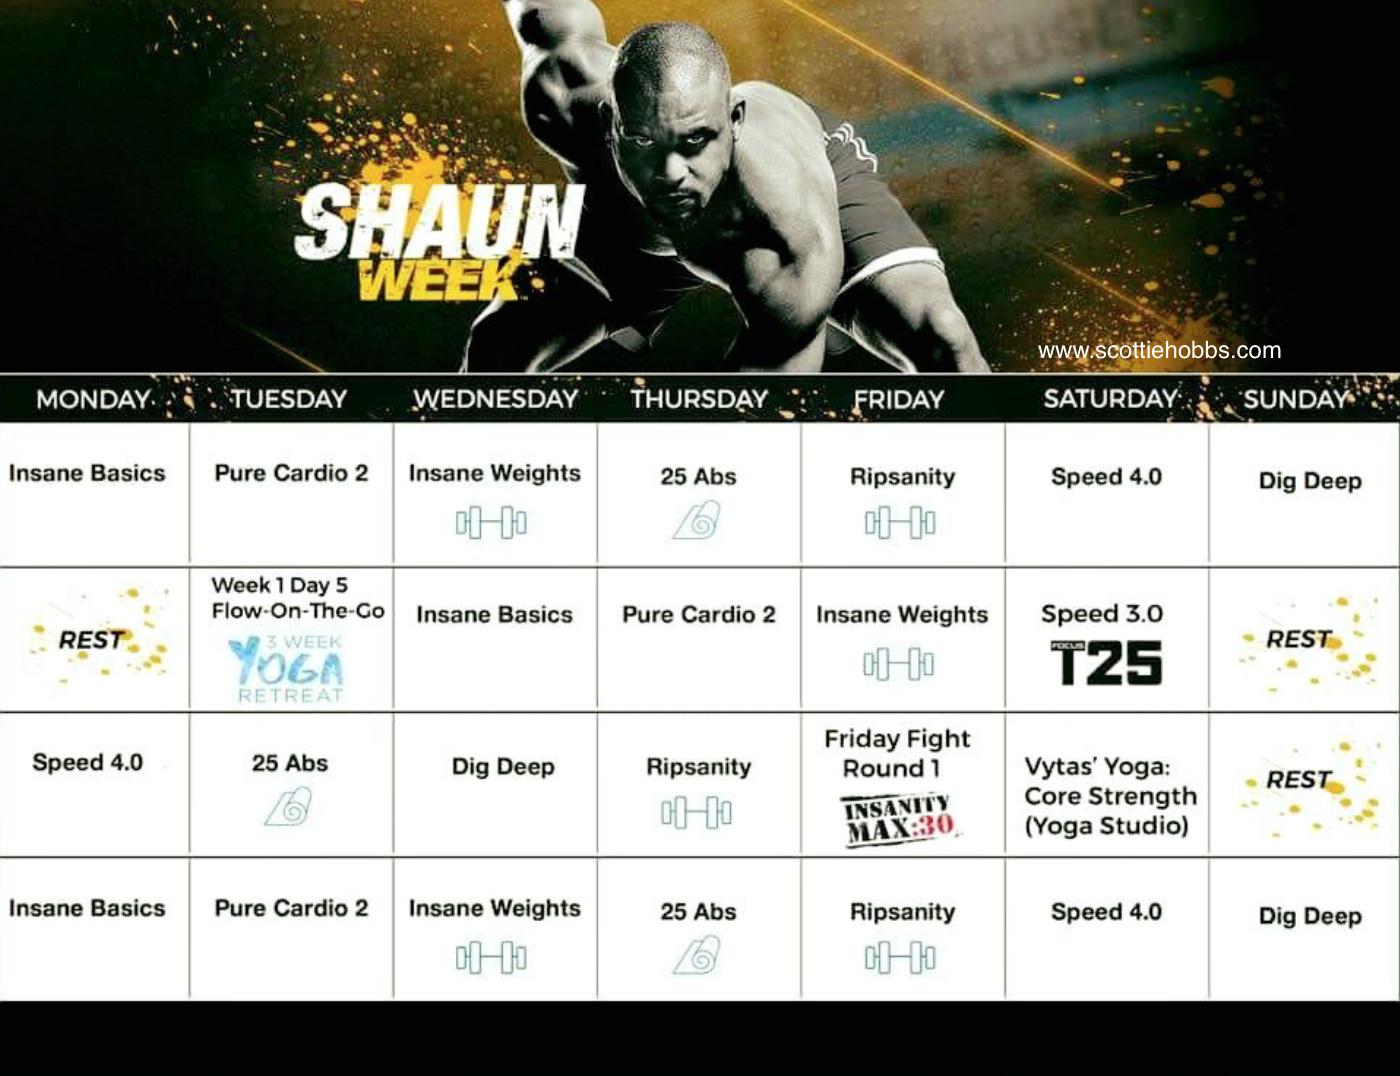 Shaun Week Hybrid Schedule | Shaun Week, Workout Calendar